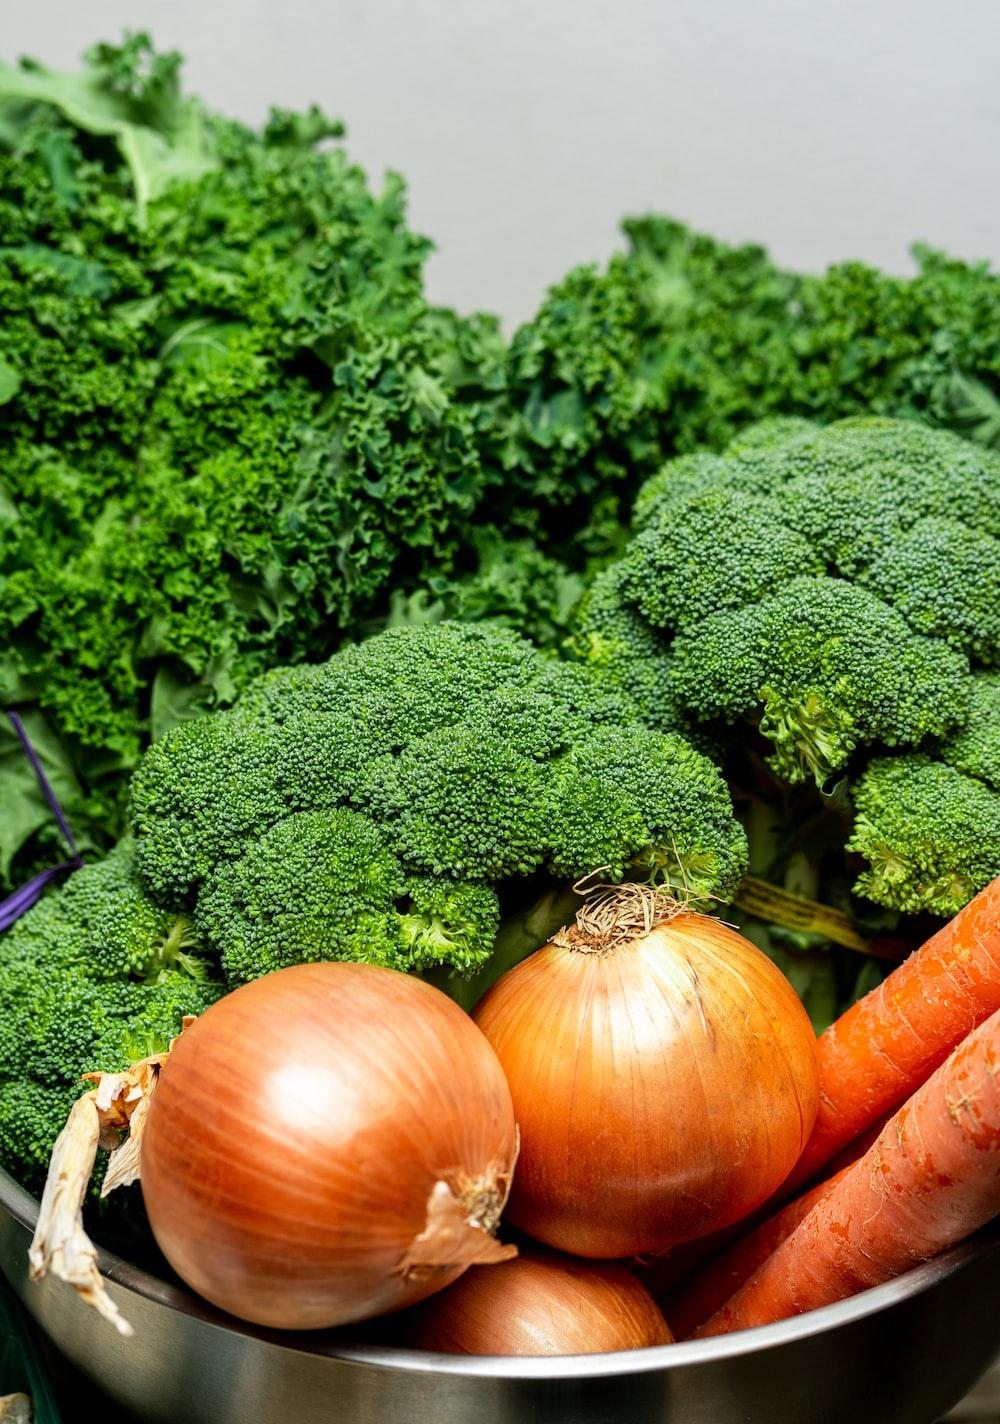 orange pumpkins and green vegetable